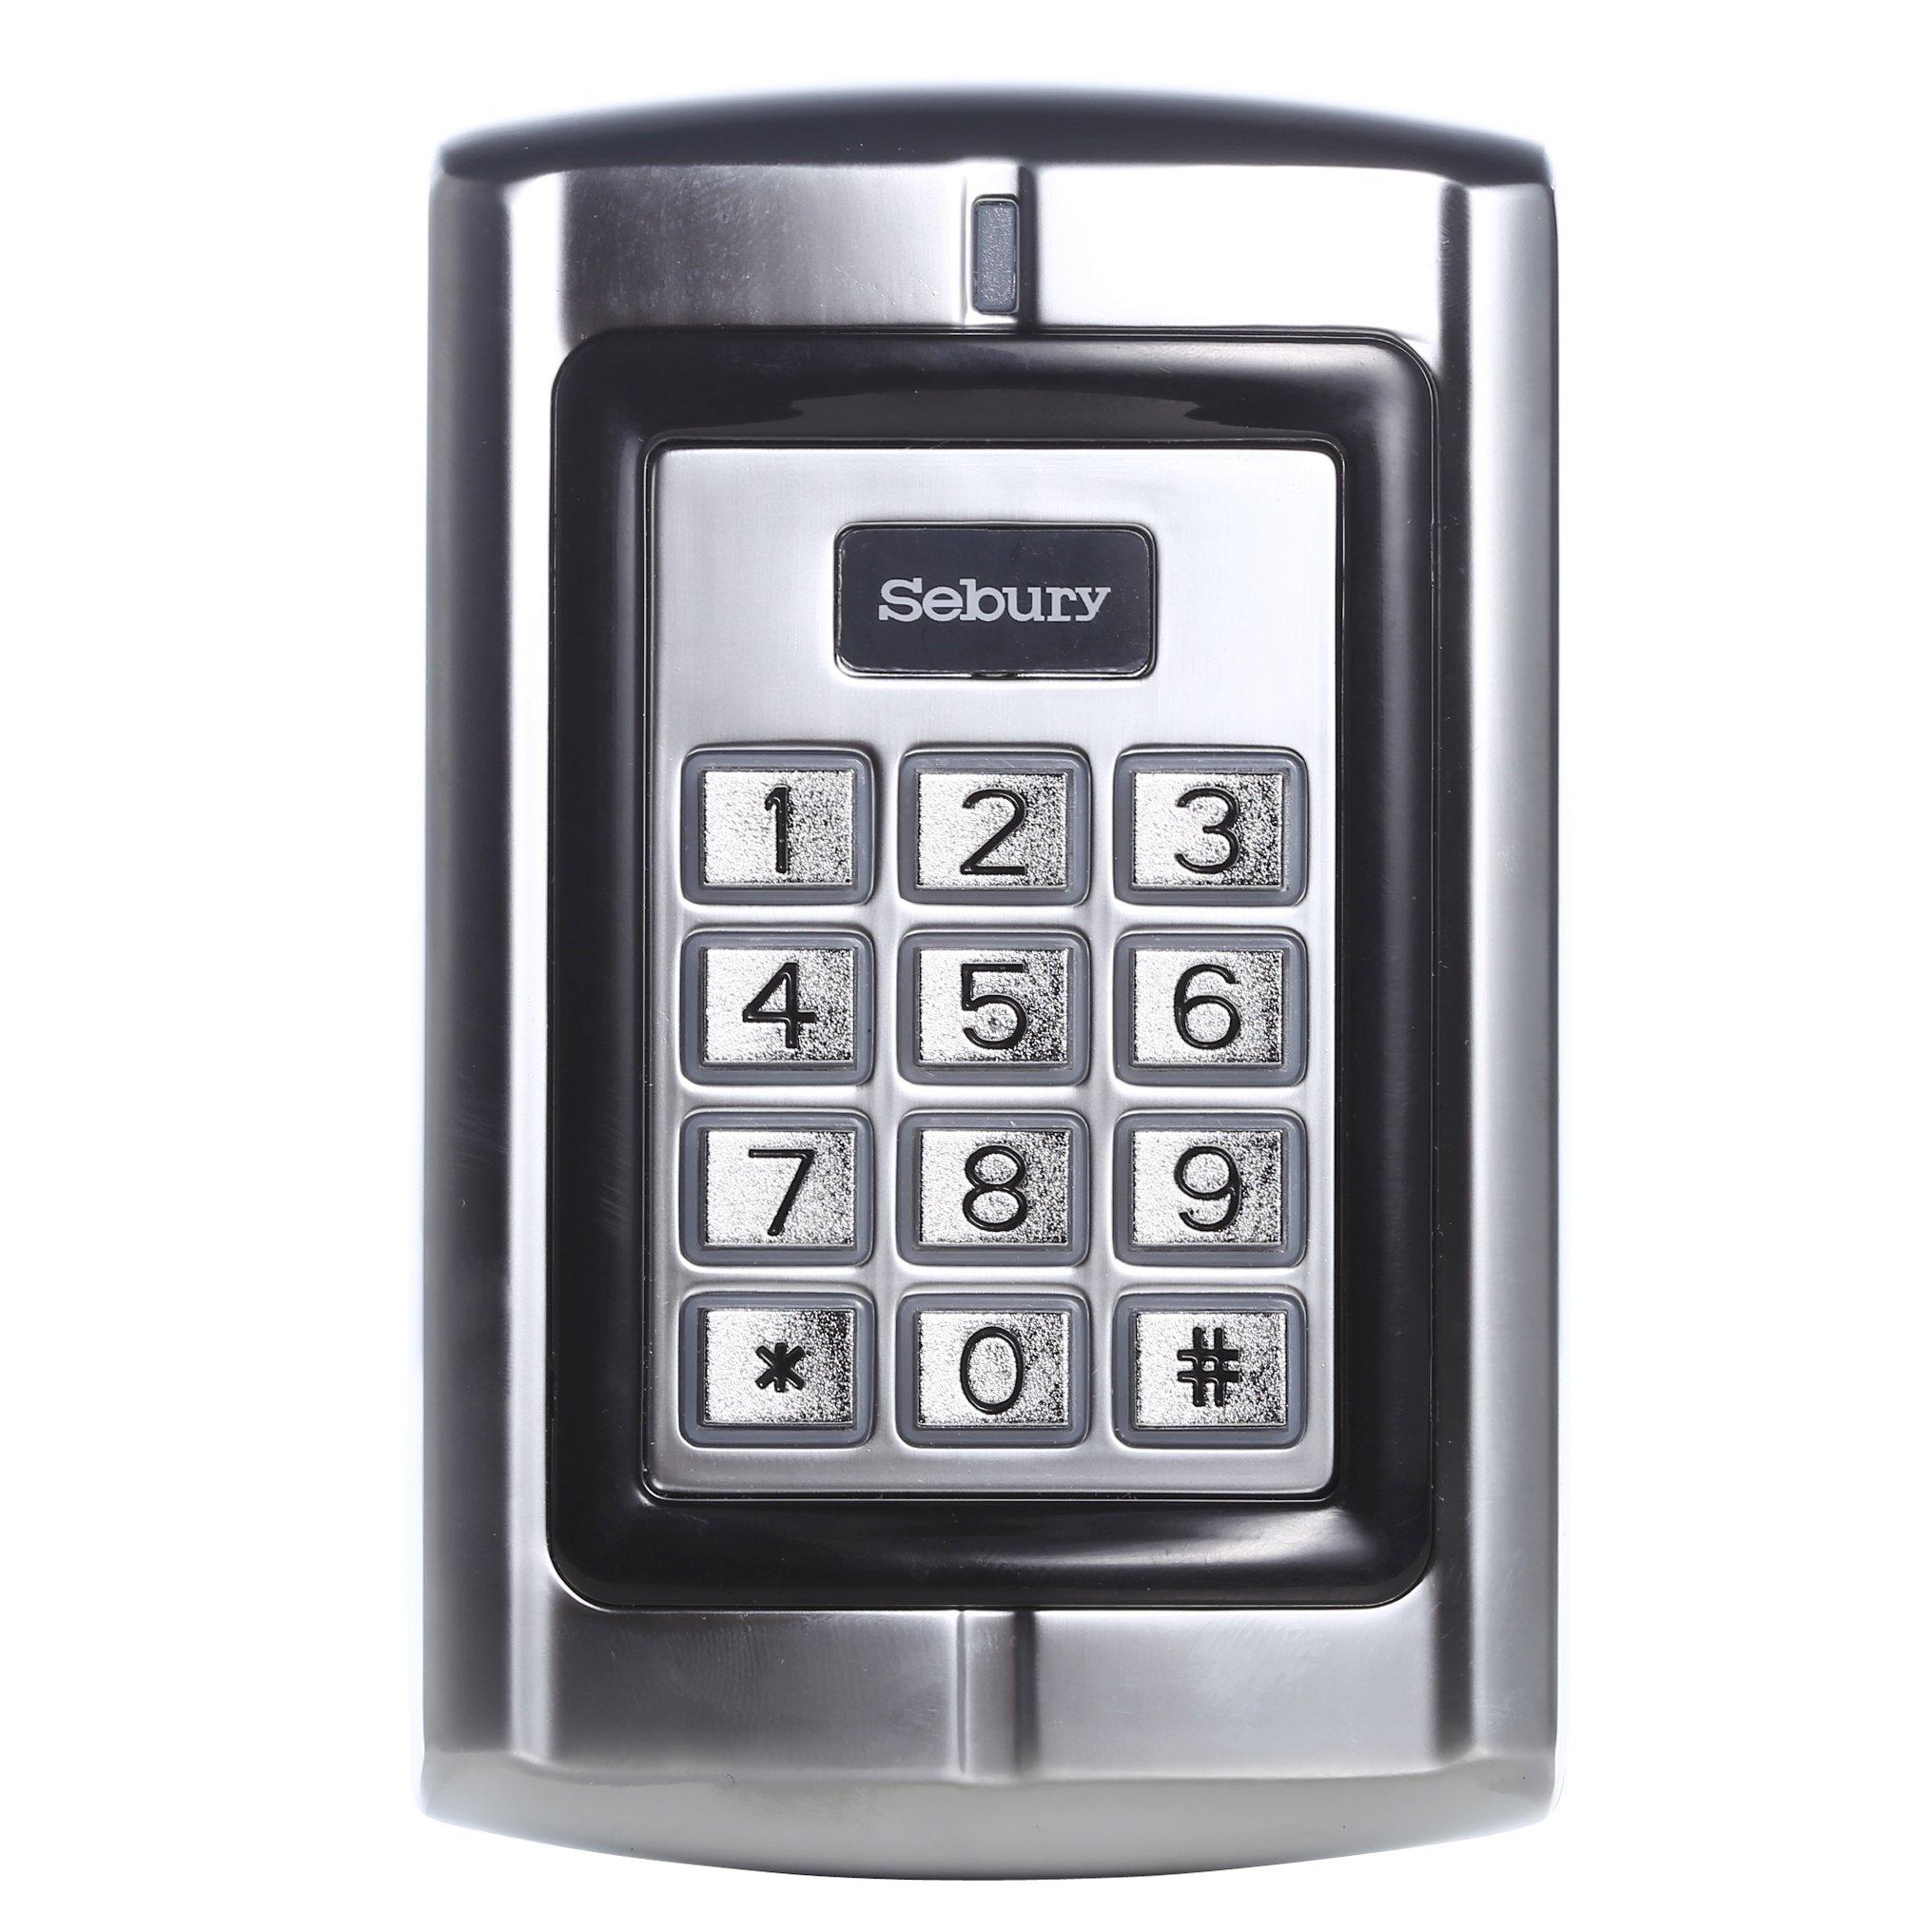 UHPPOTE 125KHz RFID EM ID Card Metal Stand-alone Access Control Keypad